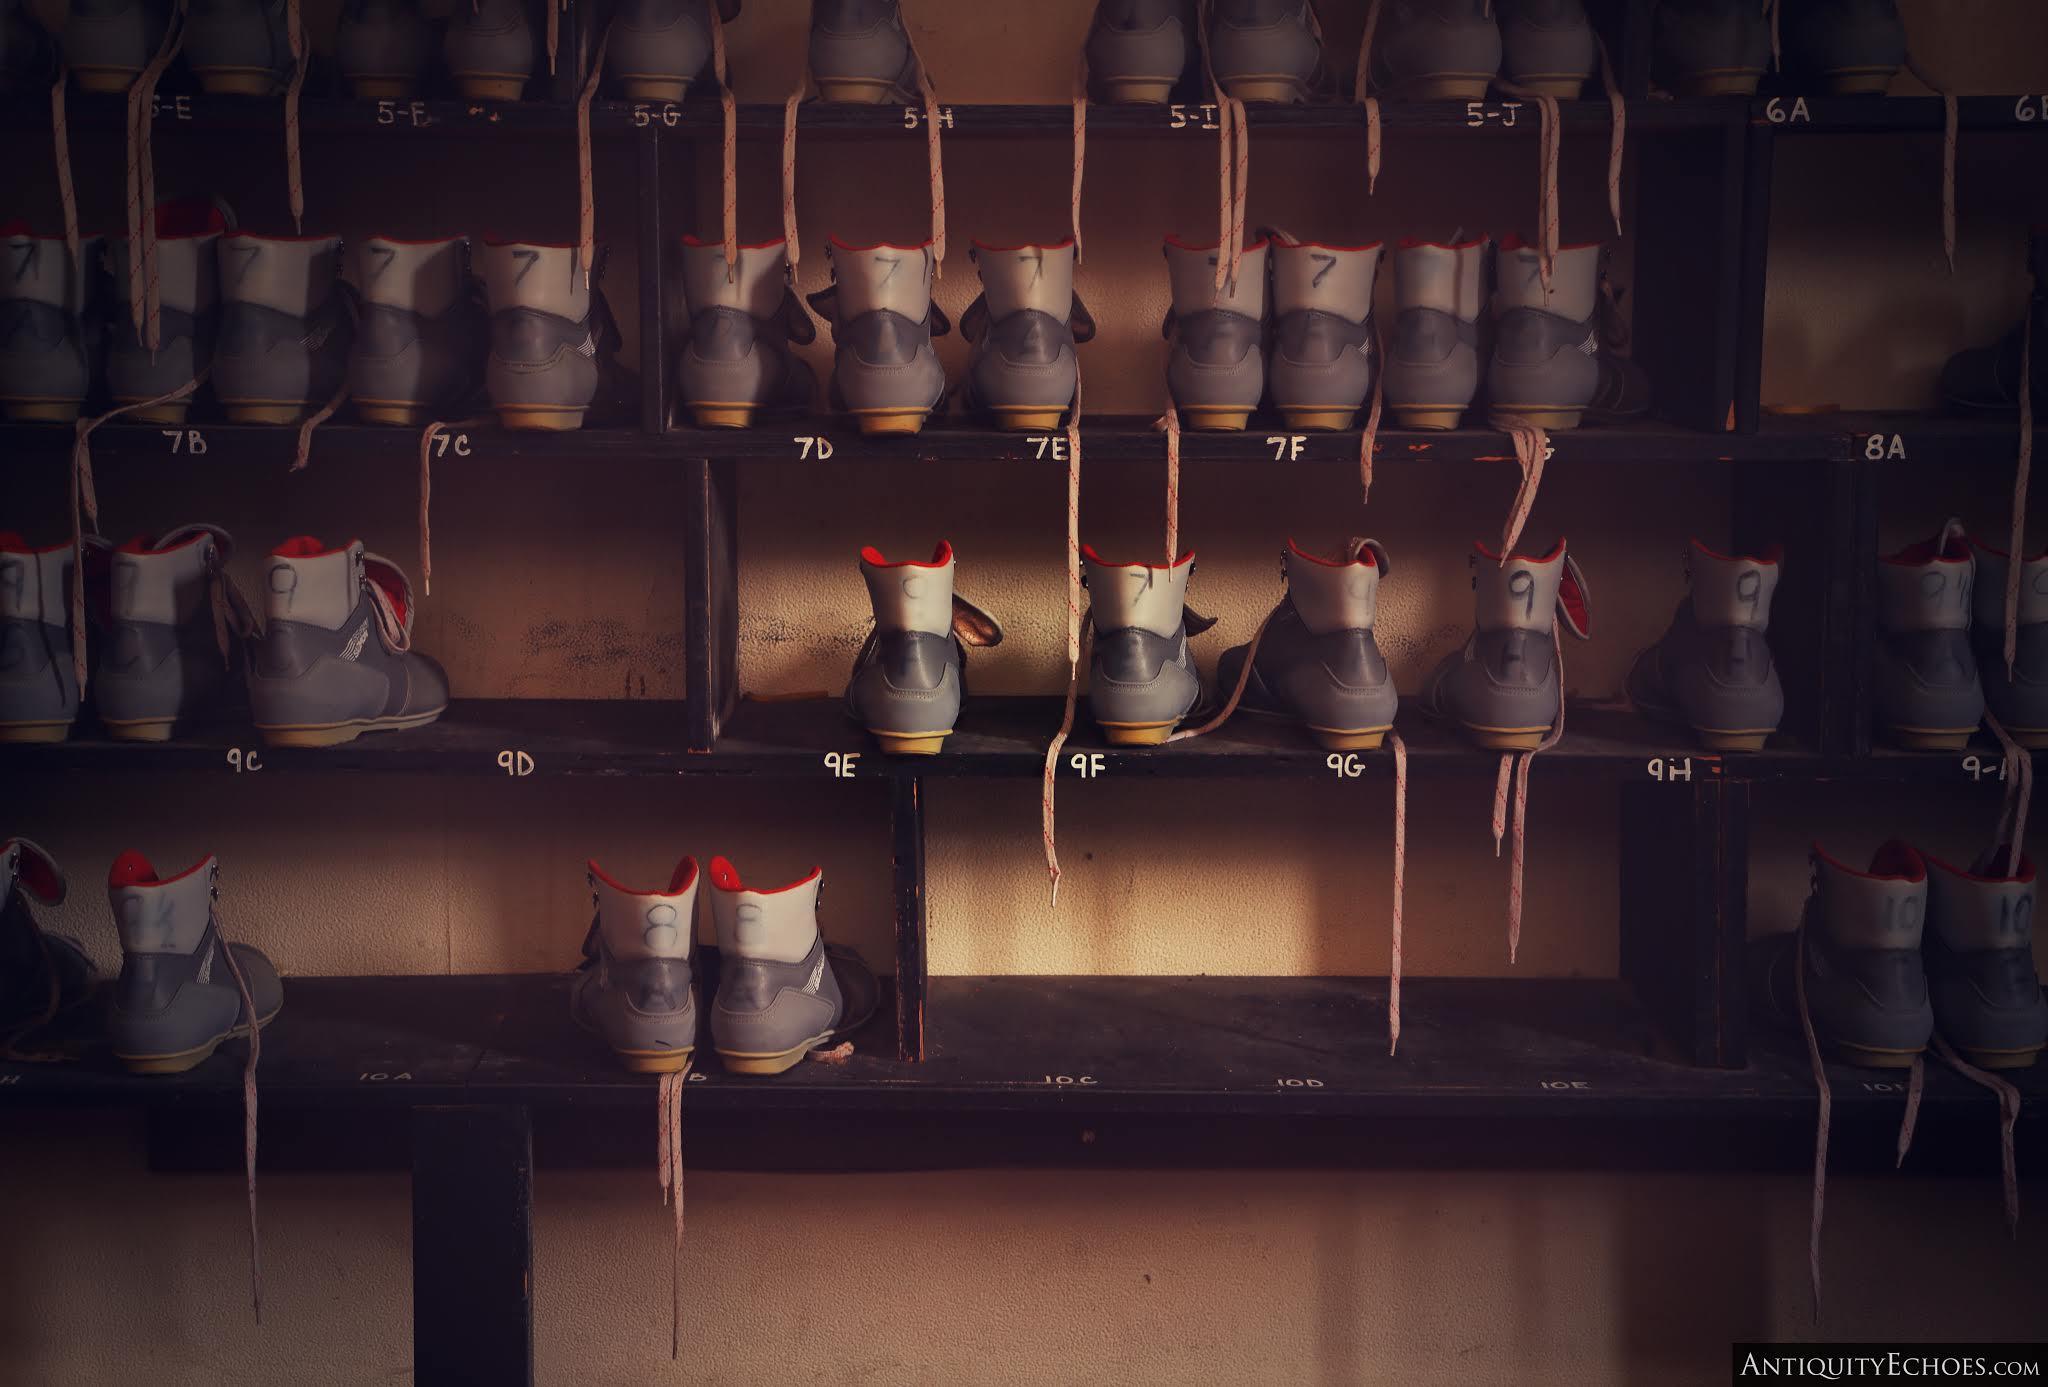 Nevele Grande - Rental Boots Line a Shelf